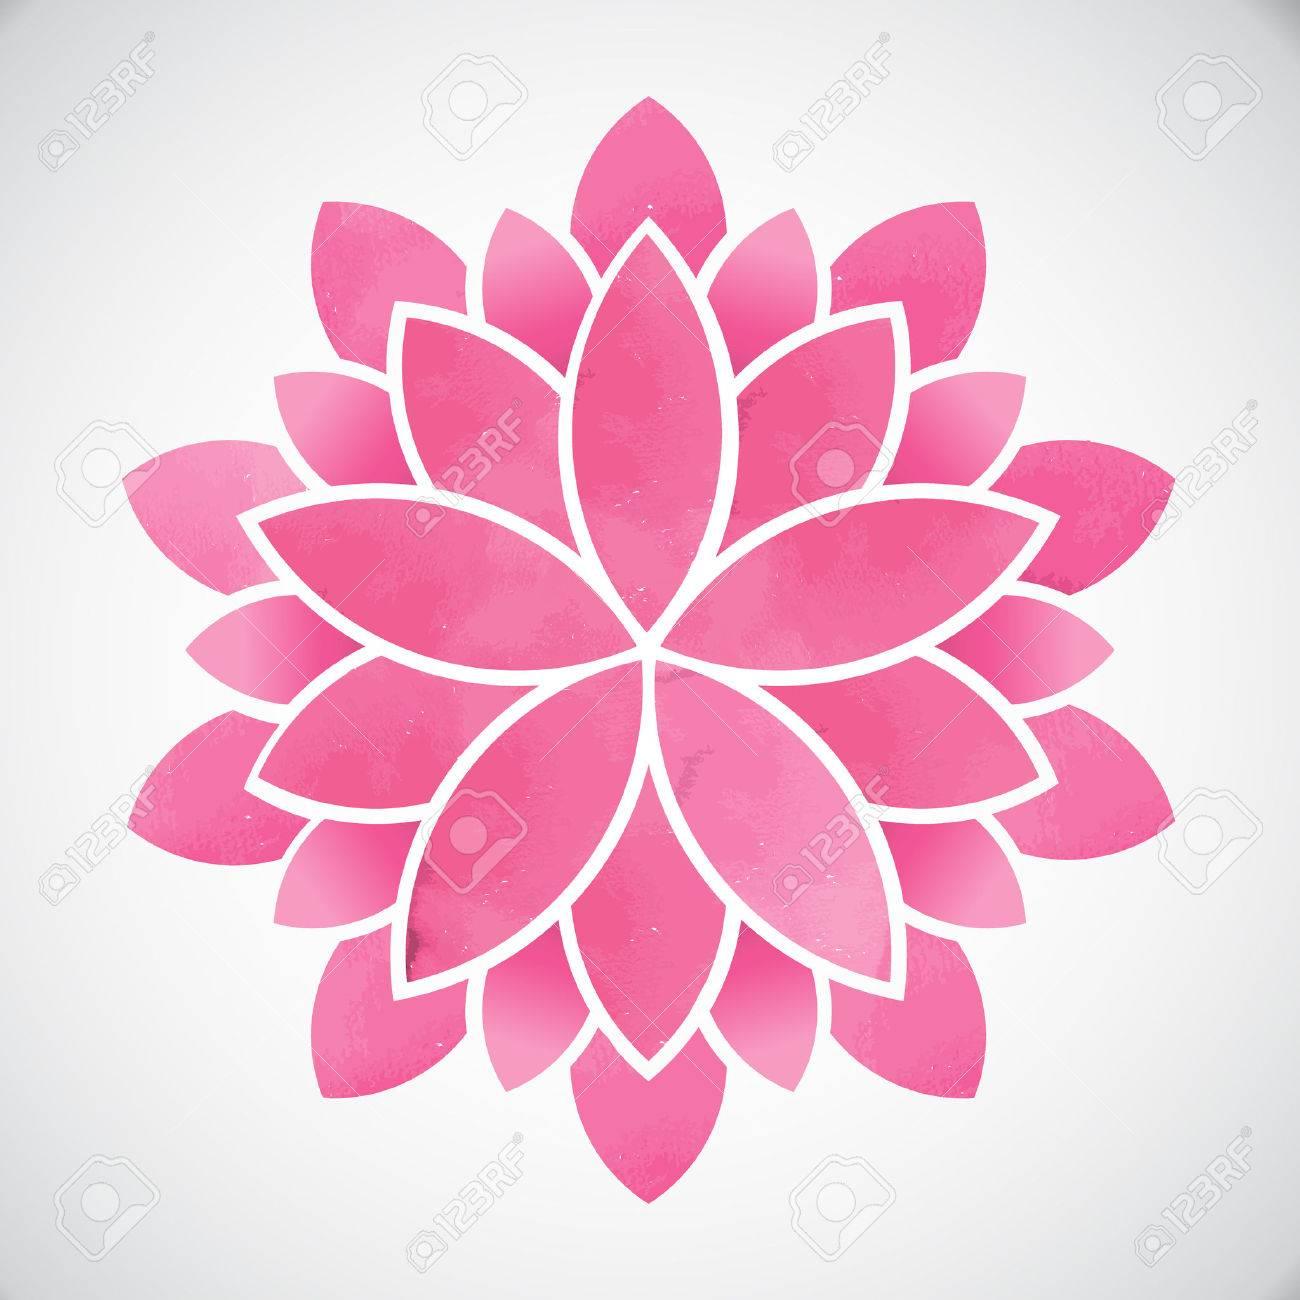 Lotus flowerwatercolor style vector graphic design royalty free lotus flowerwatercolor style vector graphic design stock vector 50748984 izmirmasajfo